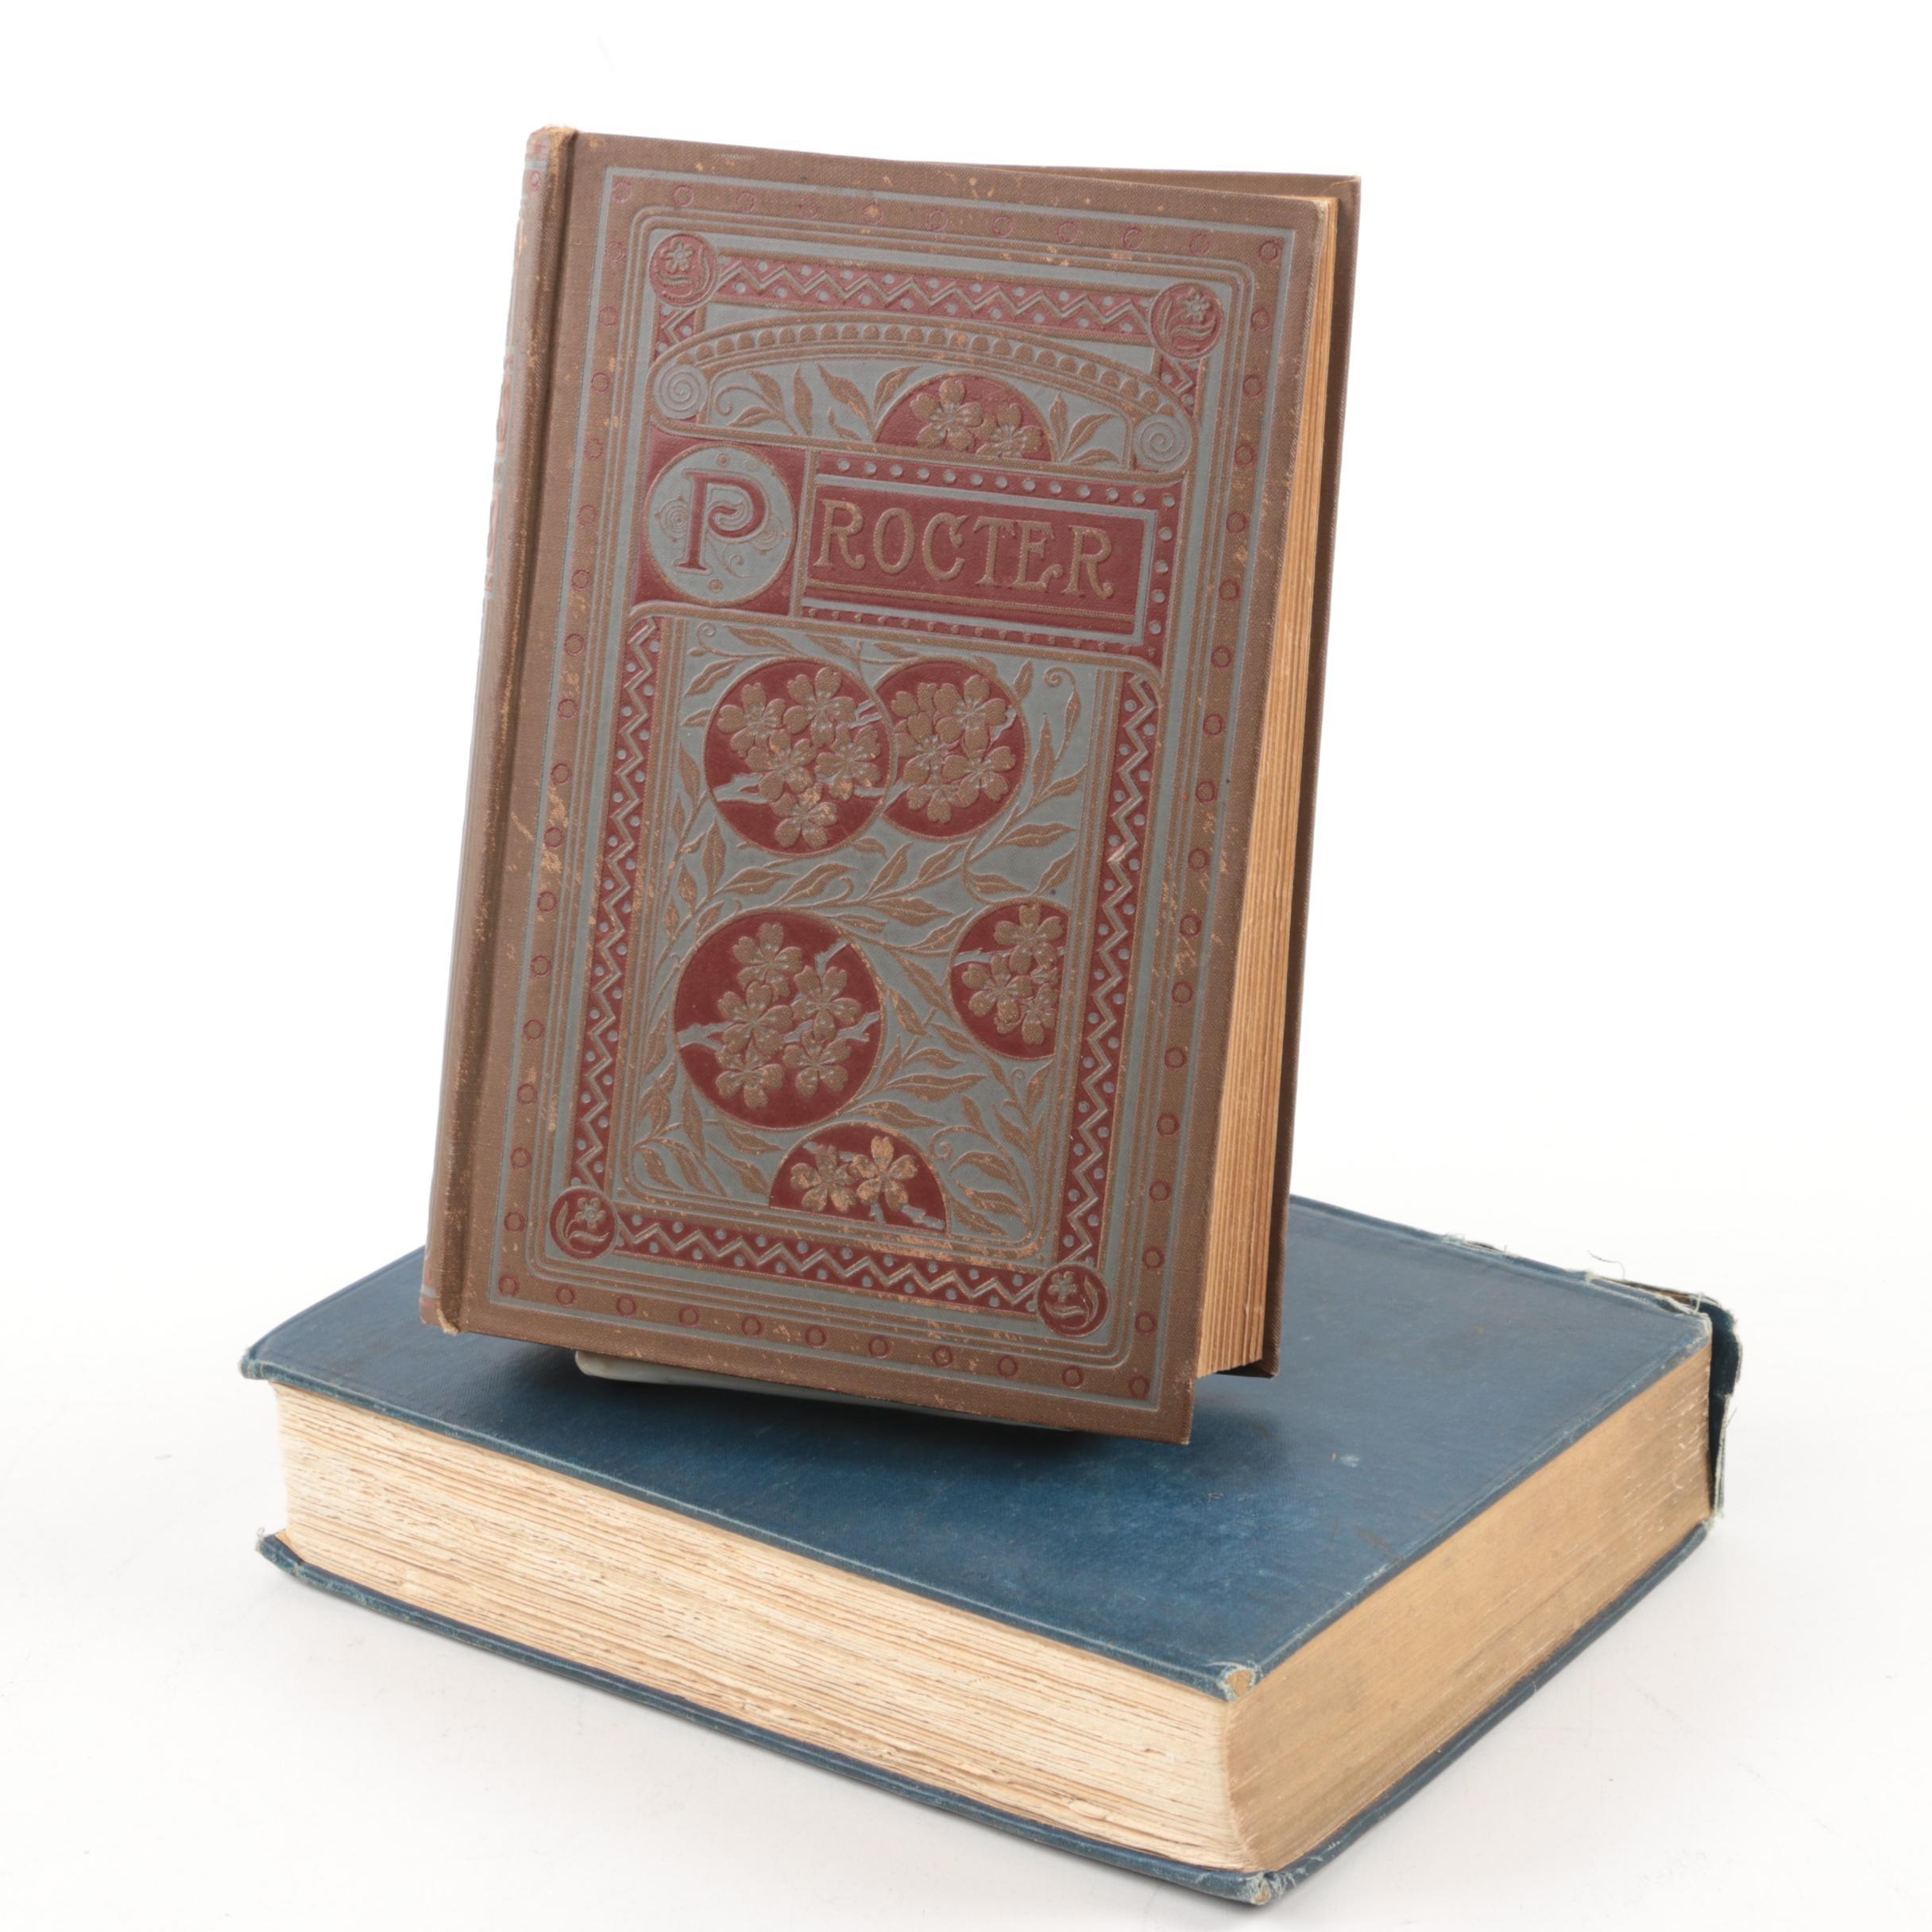 Pair of Antique Poetry Books